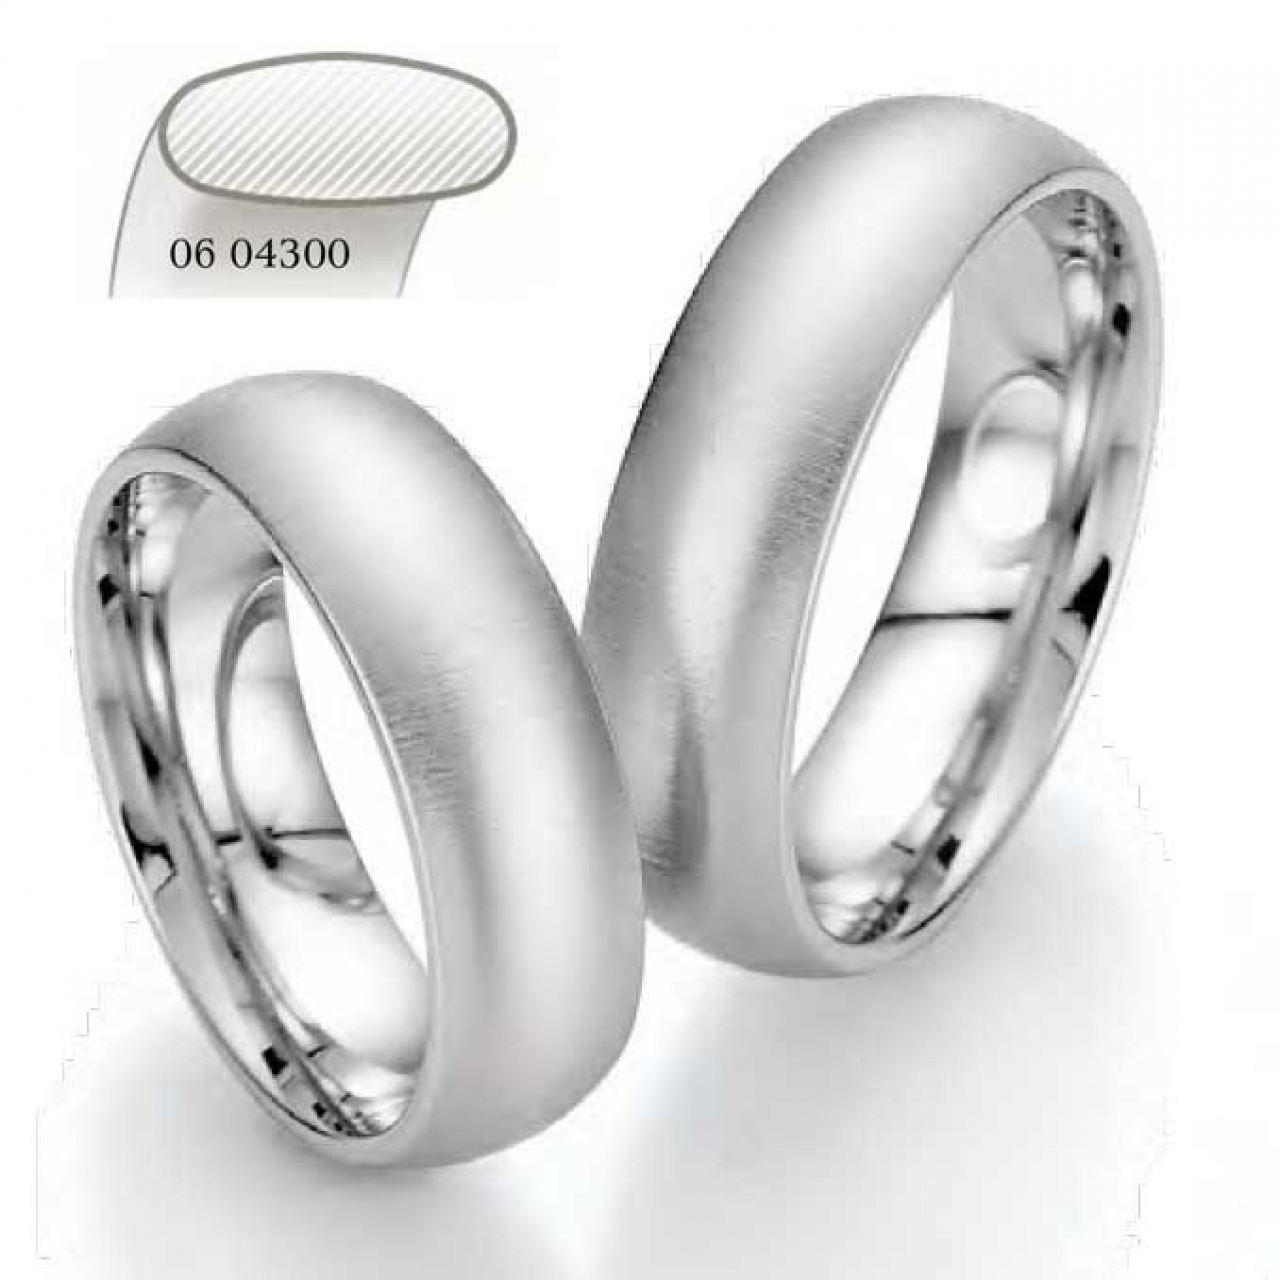 wedding-bands-rings-fischer-classics-06-04306-065